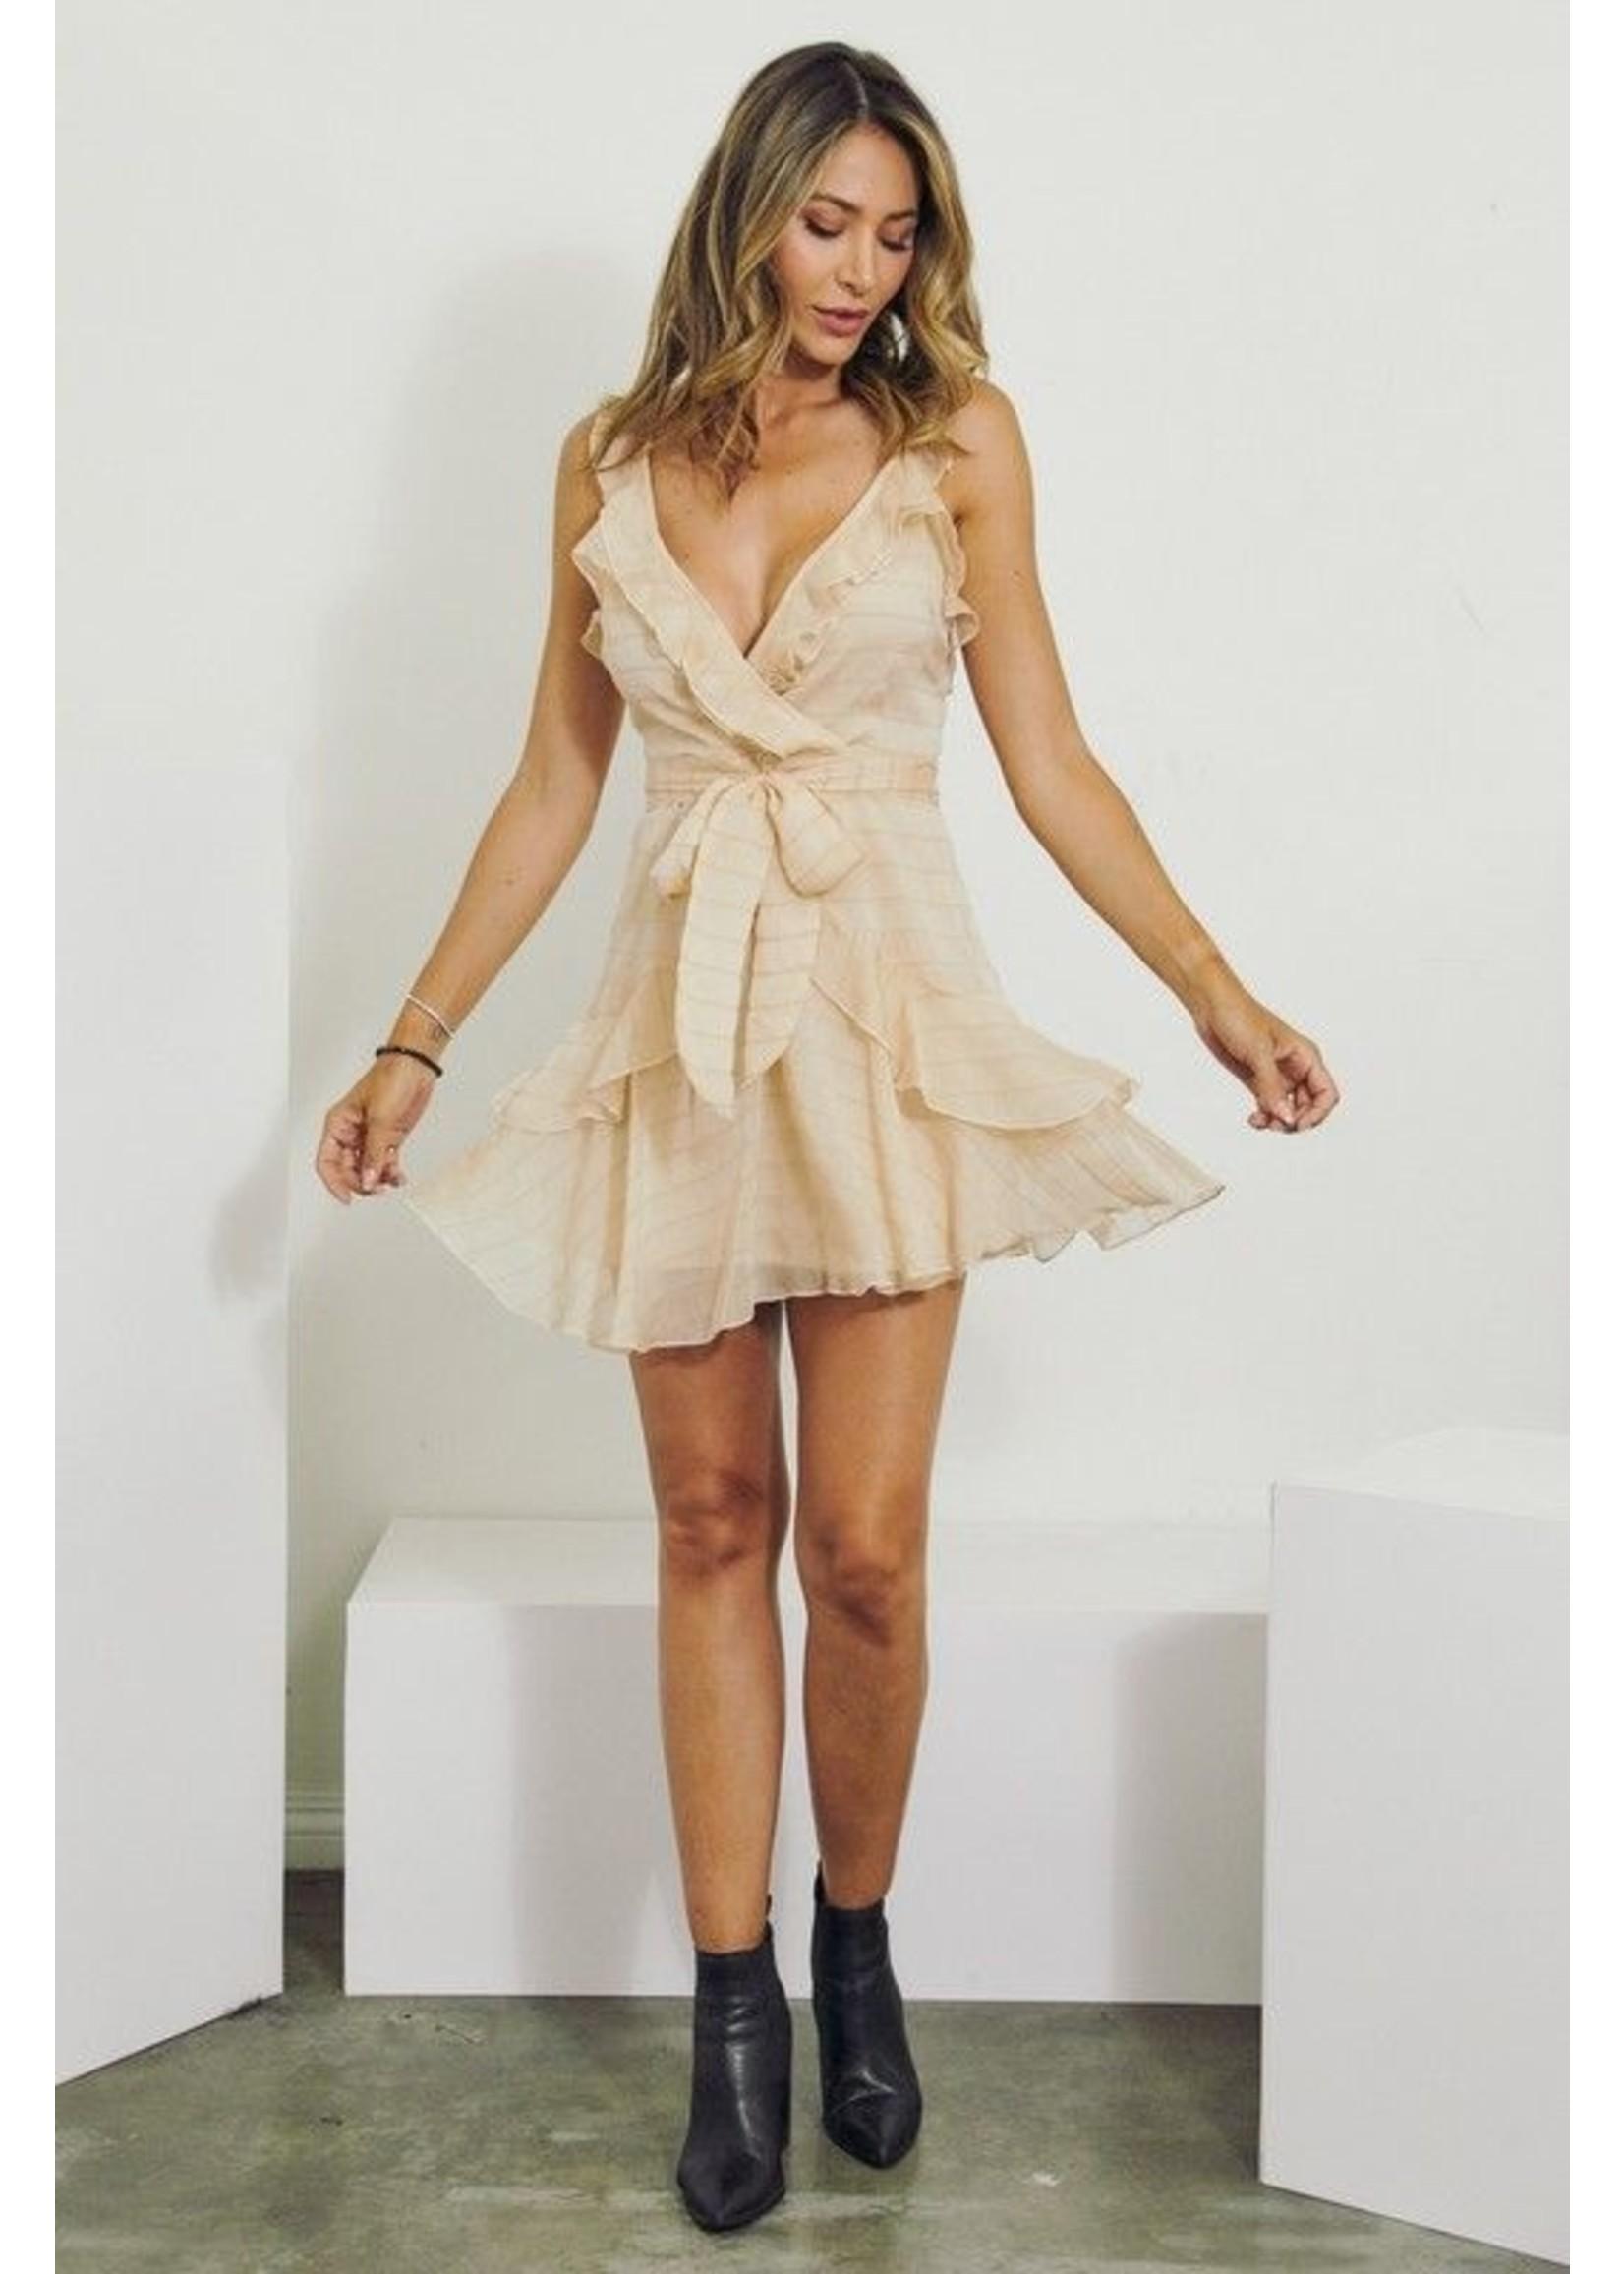 J. NNA Charlise Dress Champange